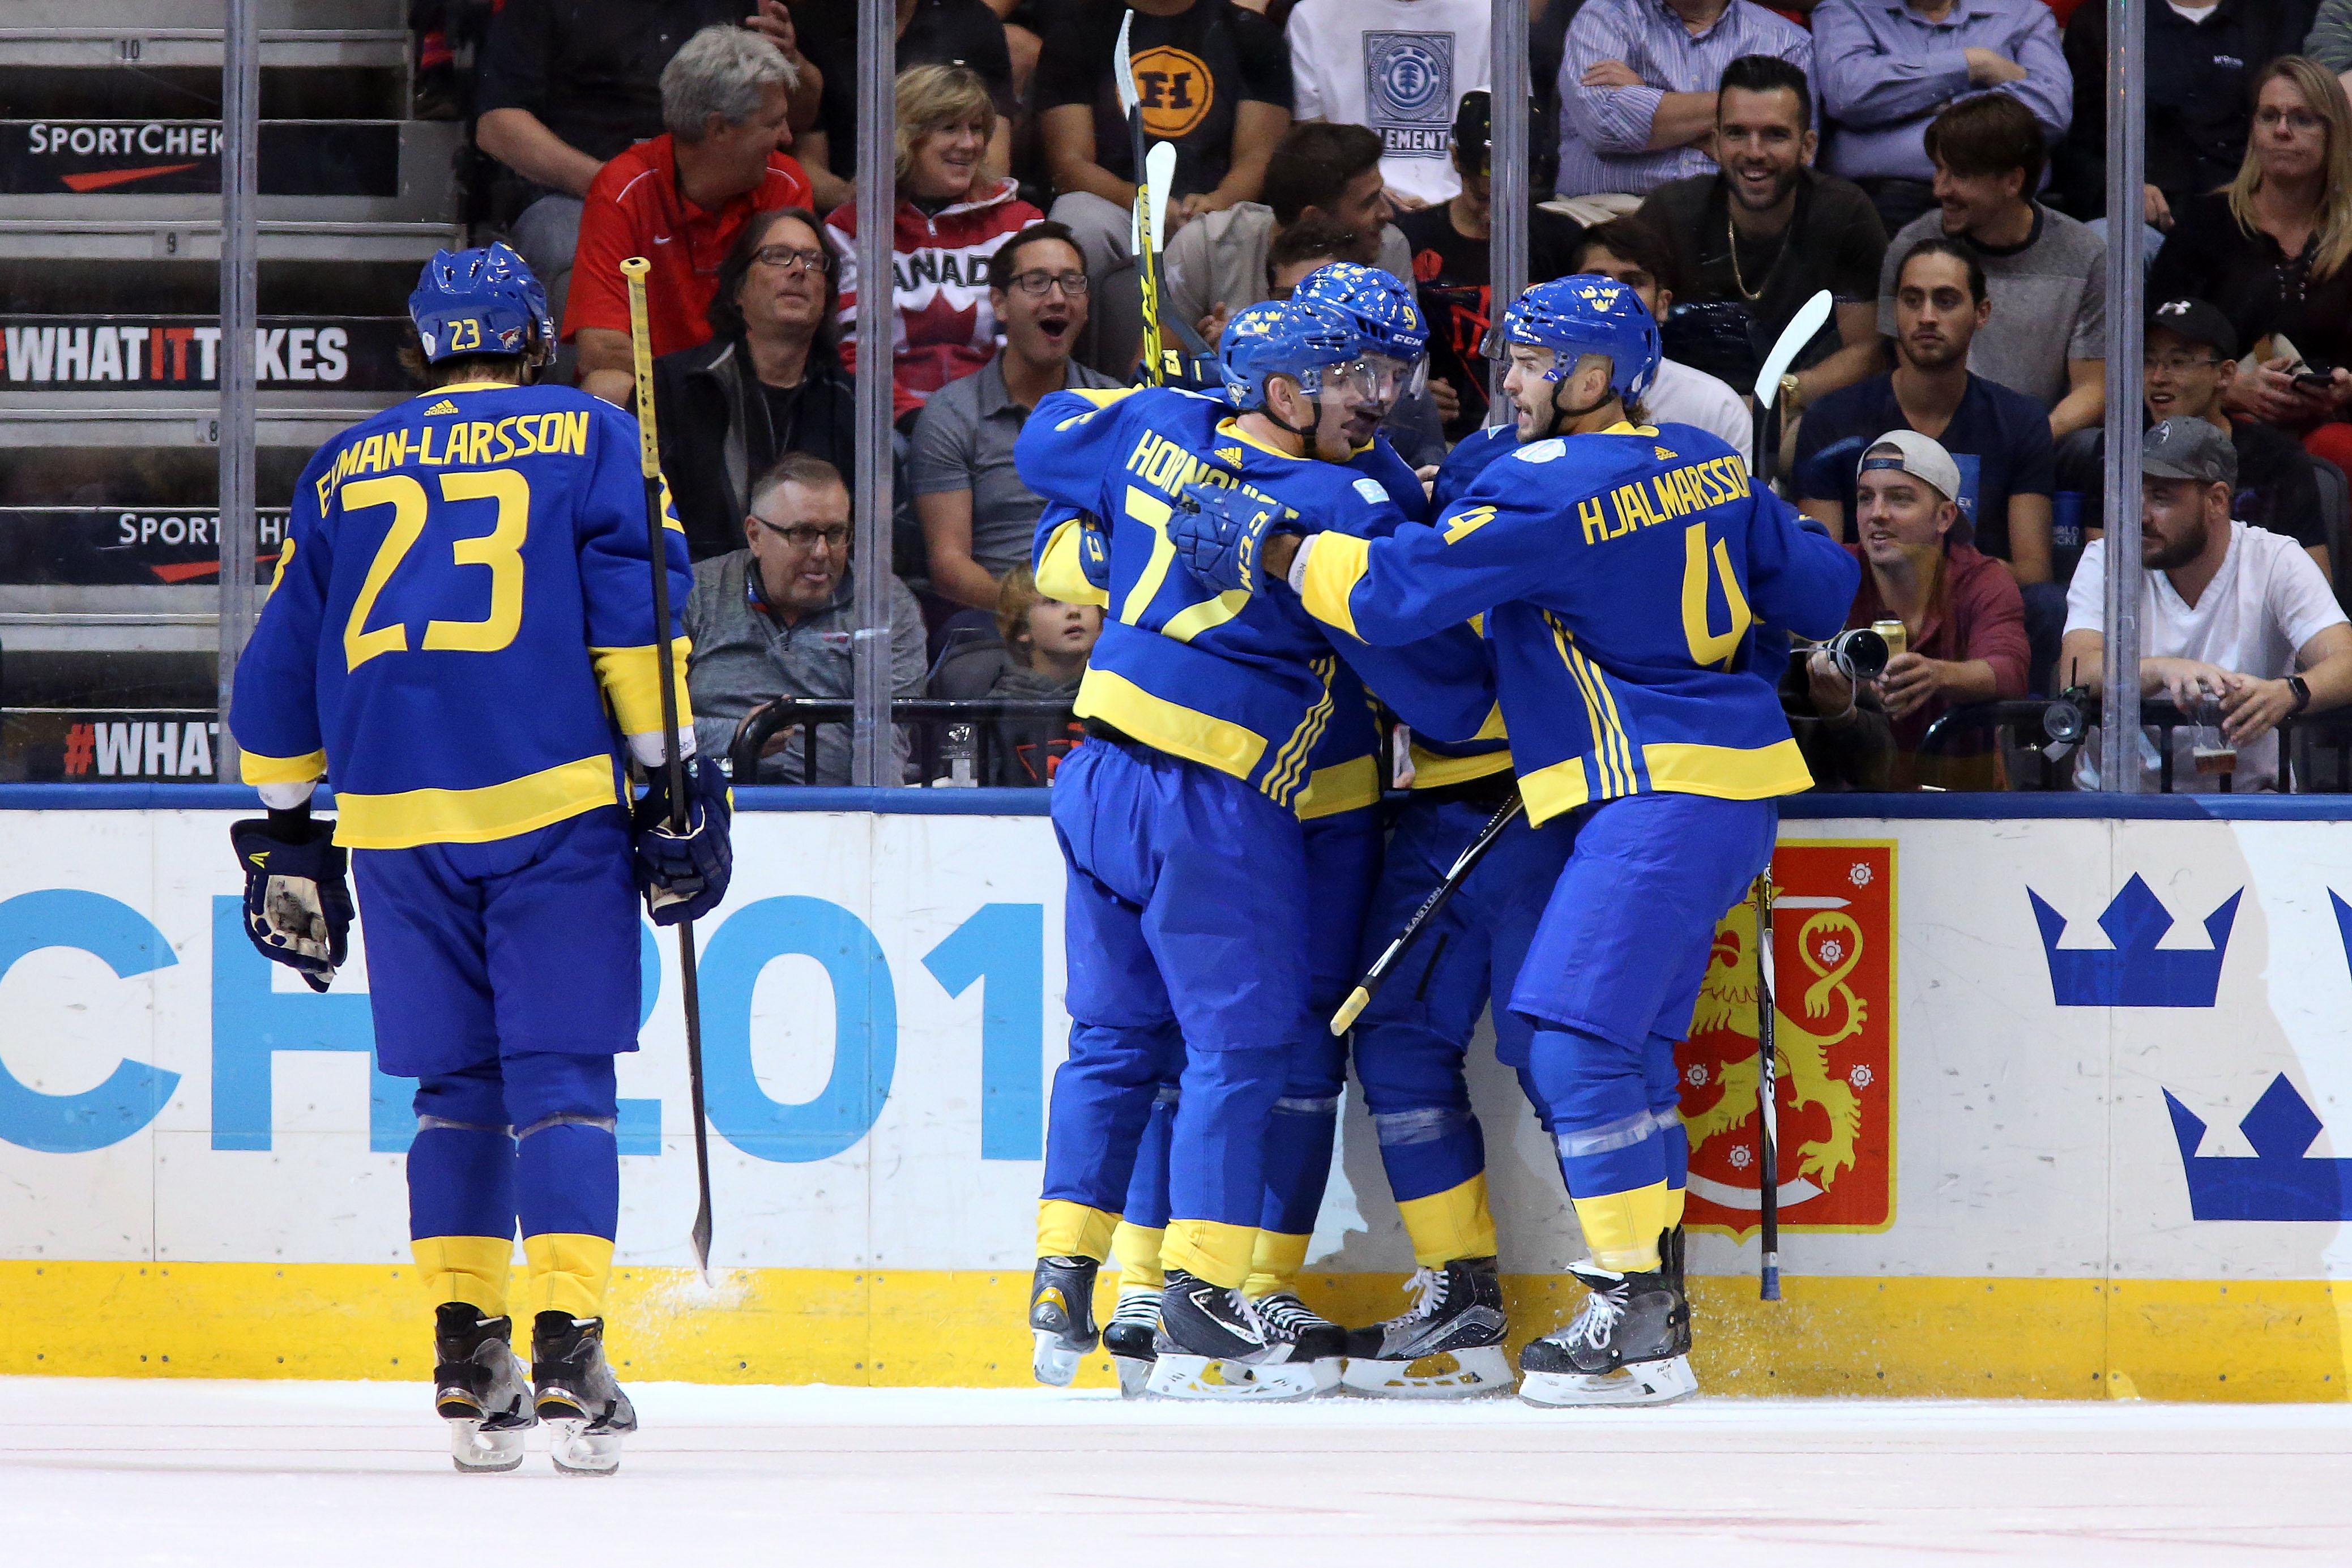 9556258-hockey-world-cup-of-hockey-team-north-america-vs-team-sweden